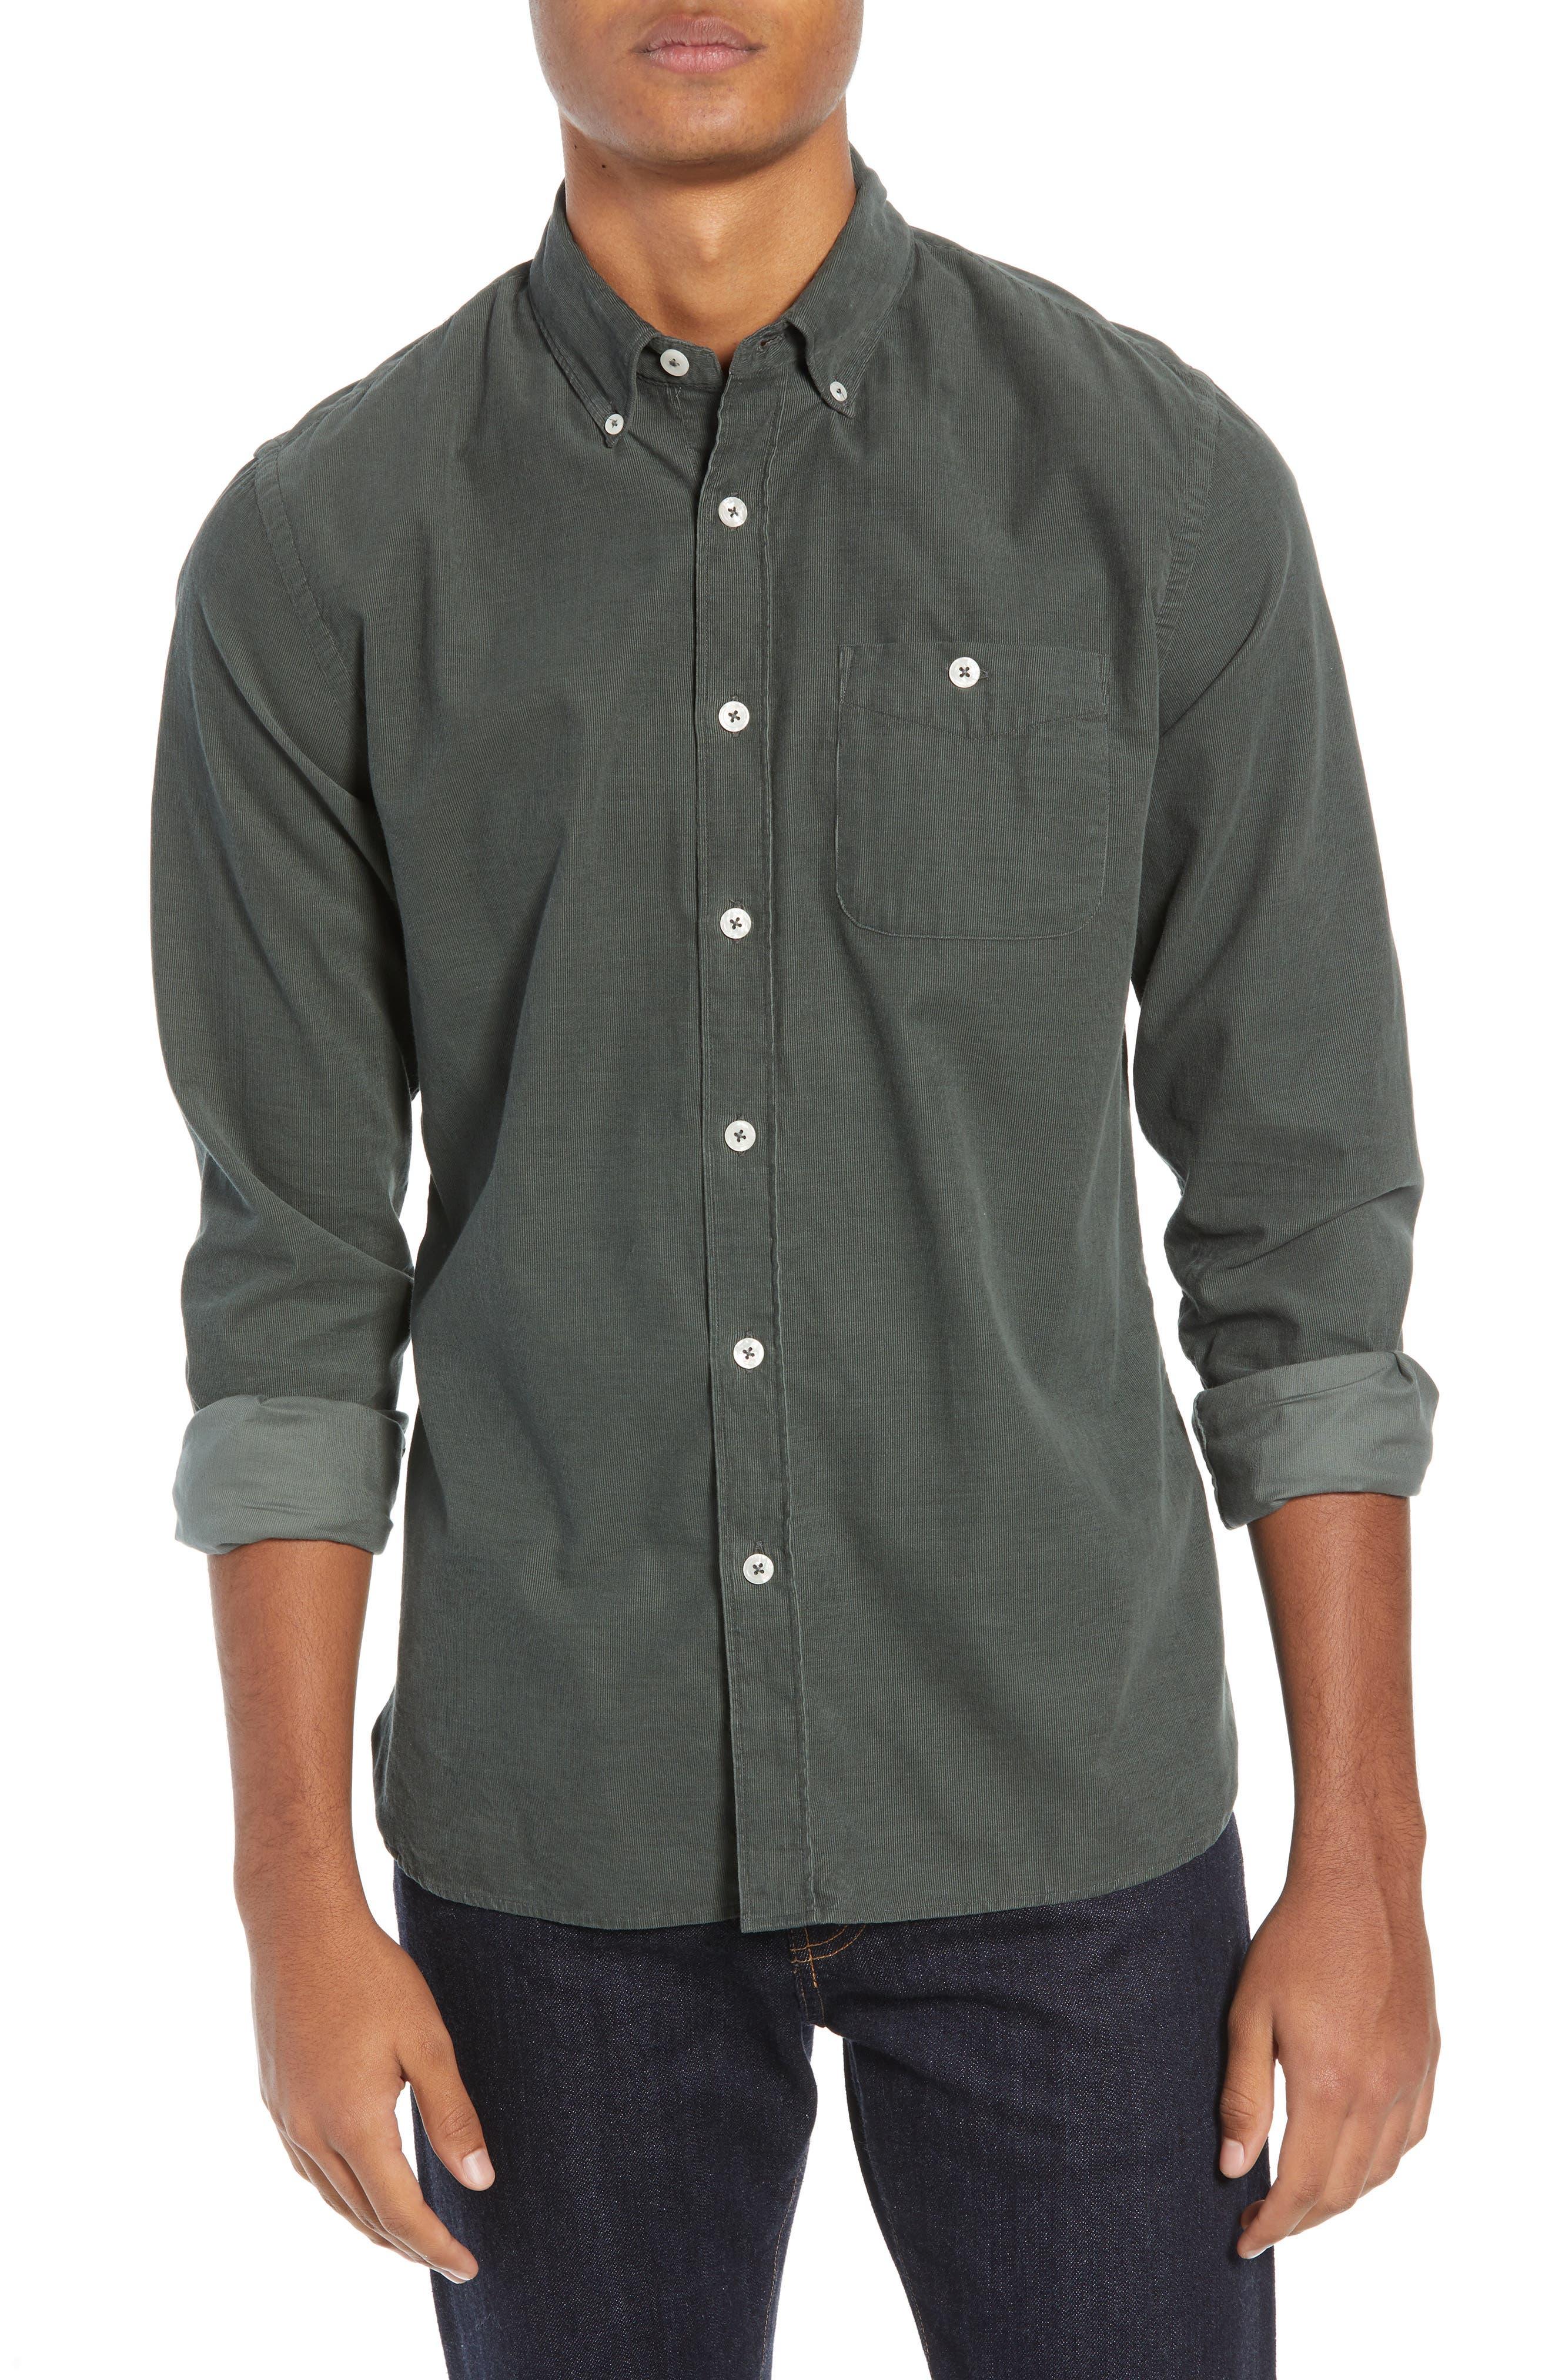 TODD SNYDER Micro Corduroy Regular Fit Sport Shirt in Sage